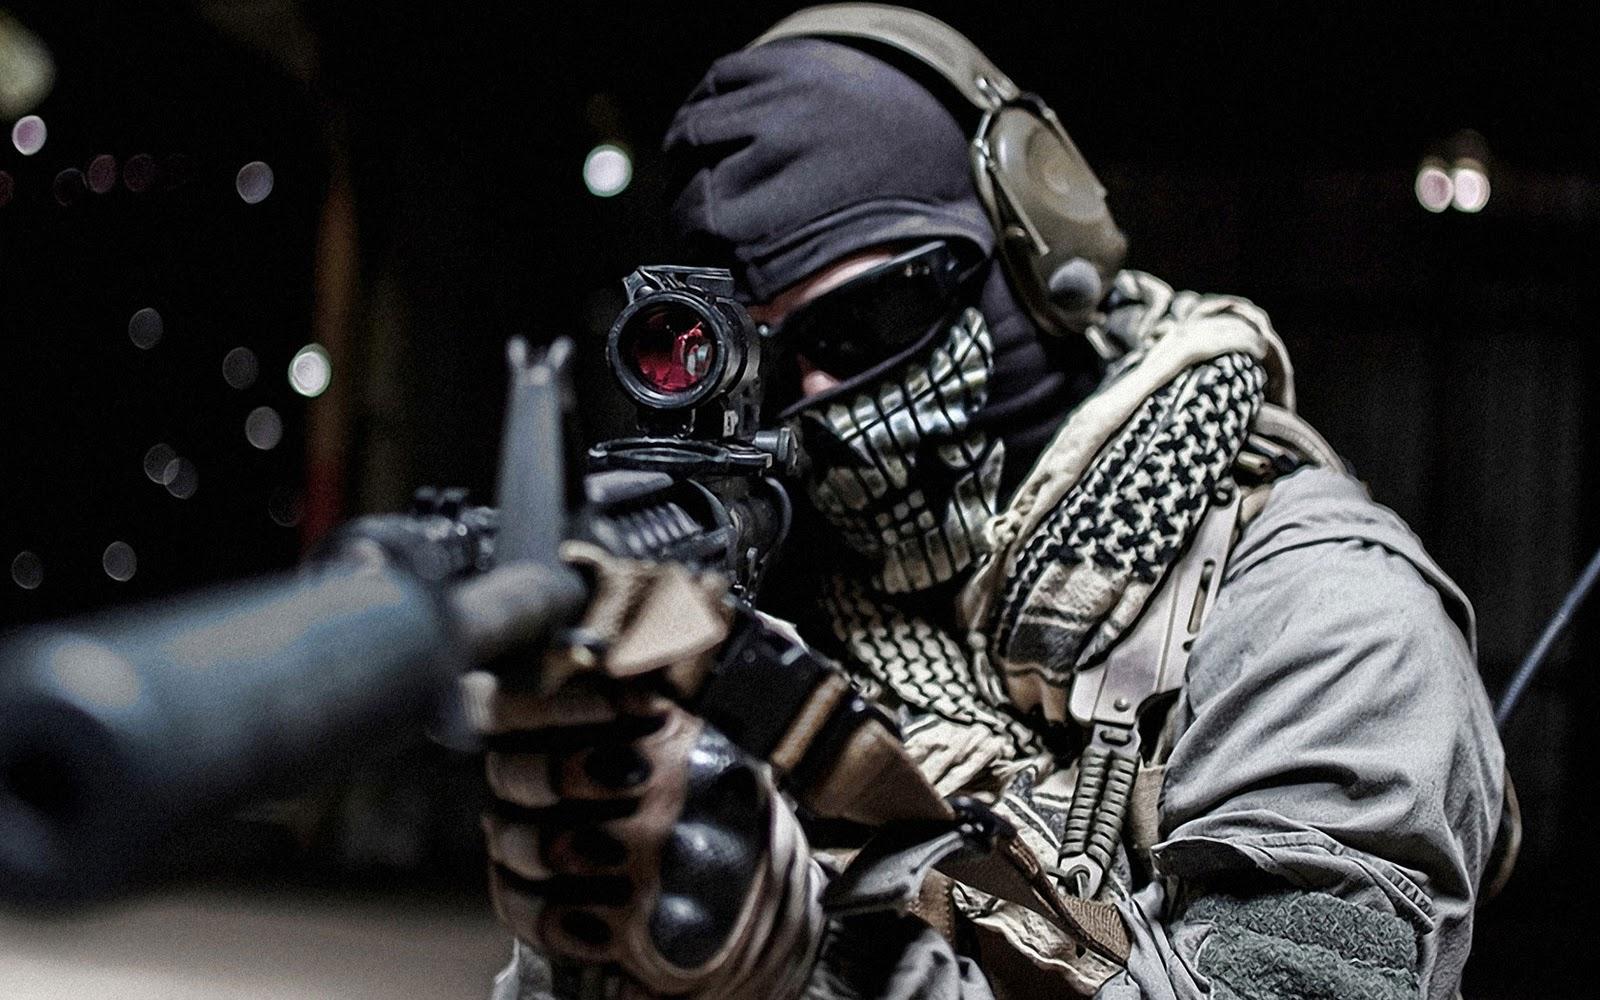 Call Of Duty 8 Modern Warfare 2 Hd Wallpaper Hd Wallpaper